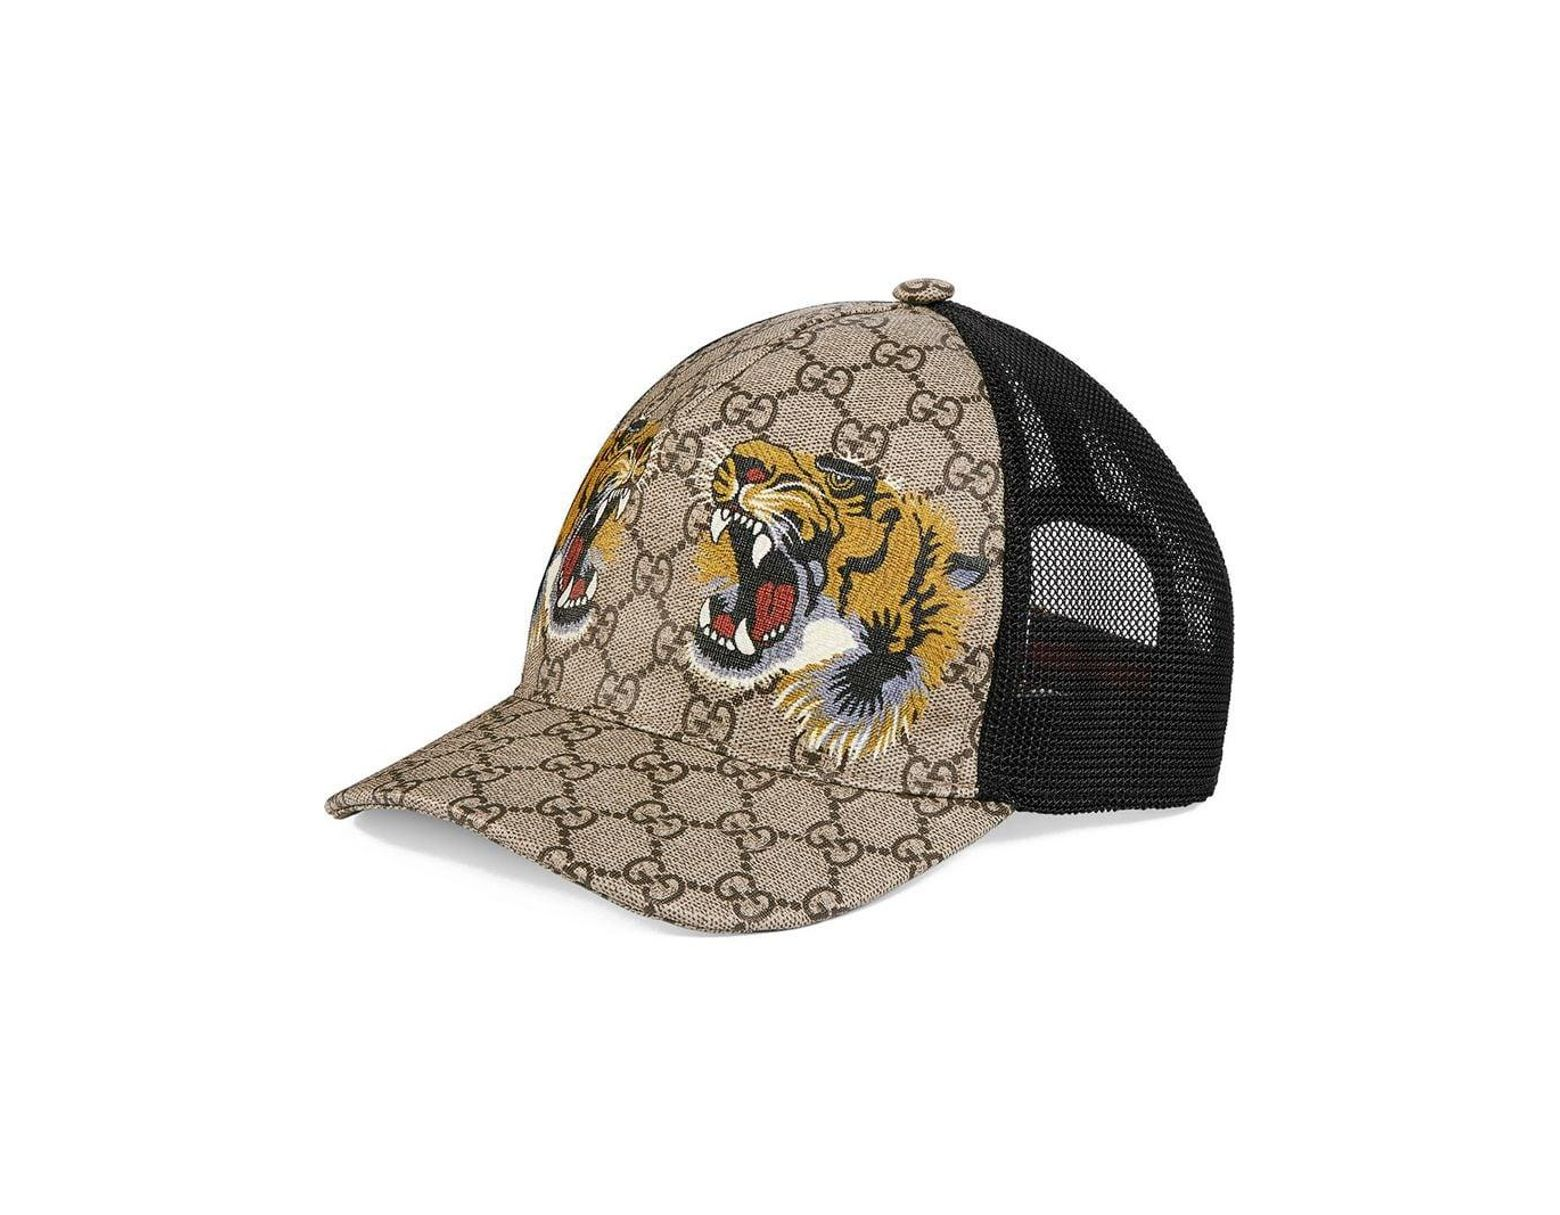 854185f5 Gucci Tigers Print GG Supreme Baseball Hat for Men - Save 7% - Lyst